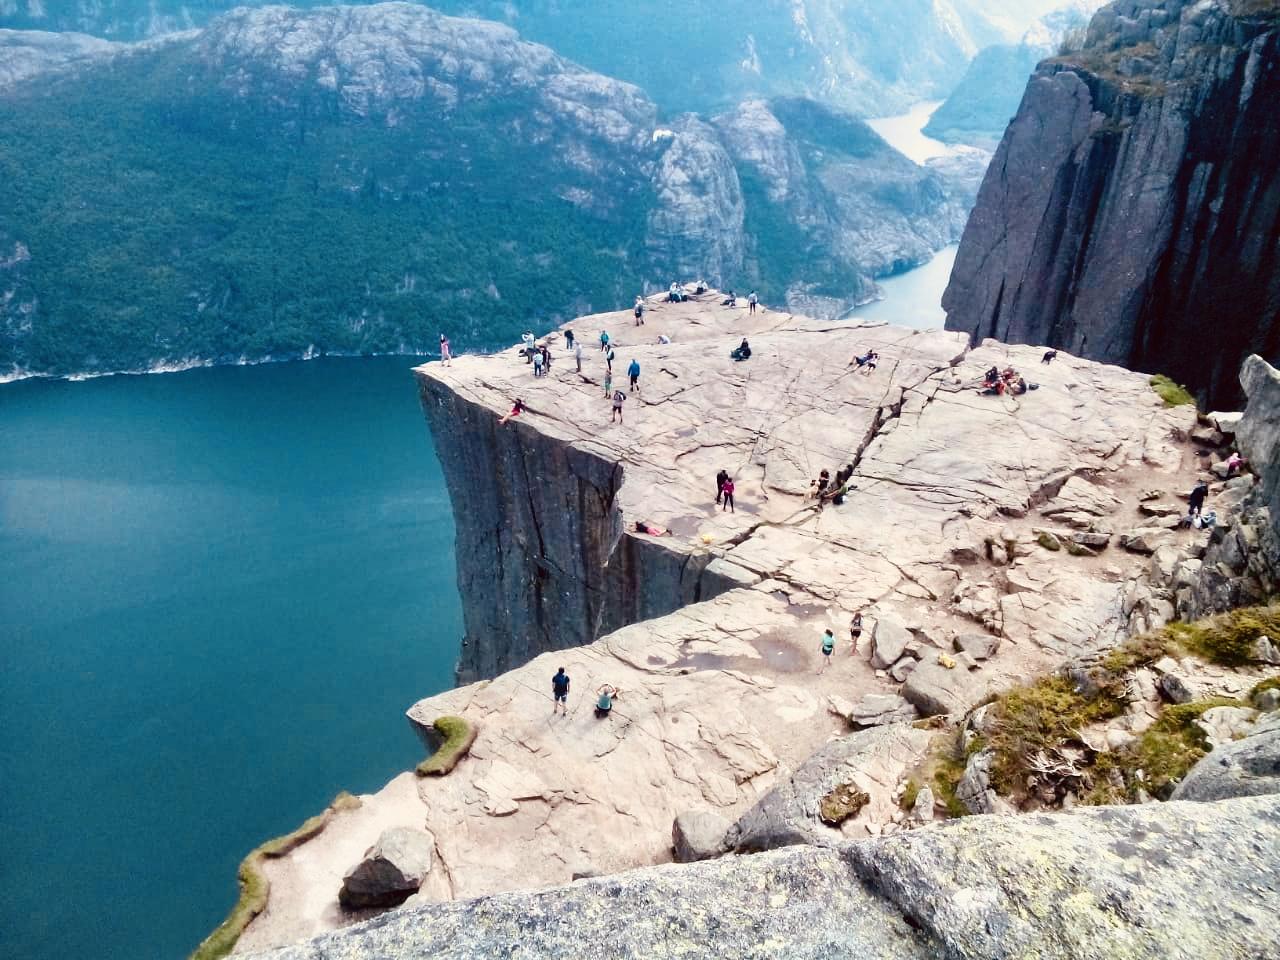 Норвегия. Когда природа завораживает!